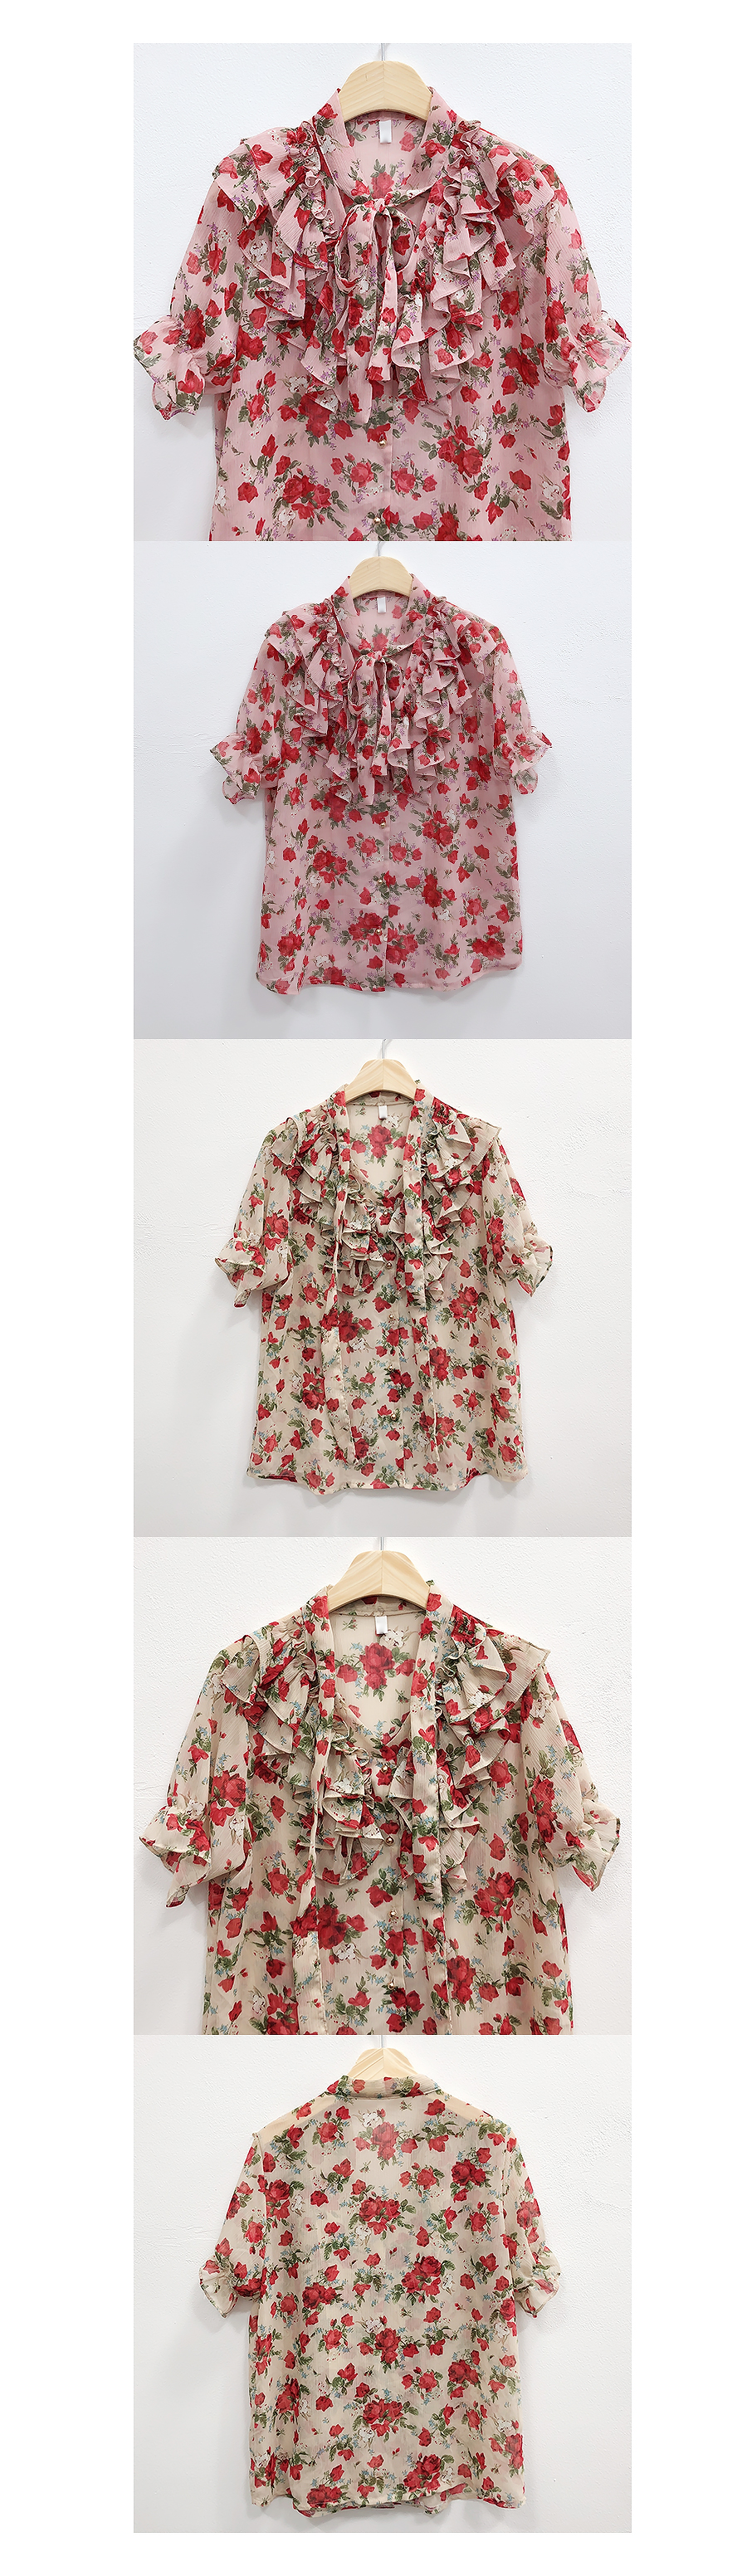 Lavigne short sleeve blouse